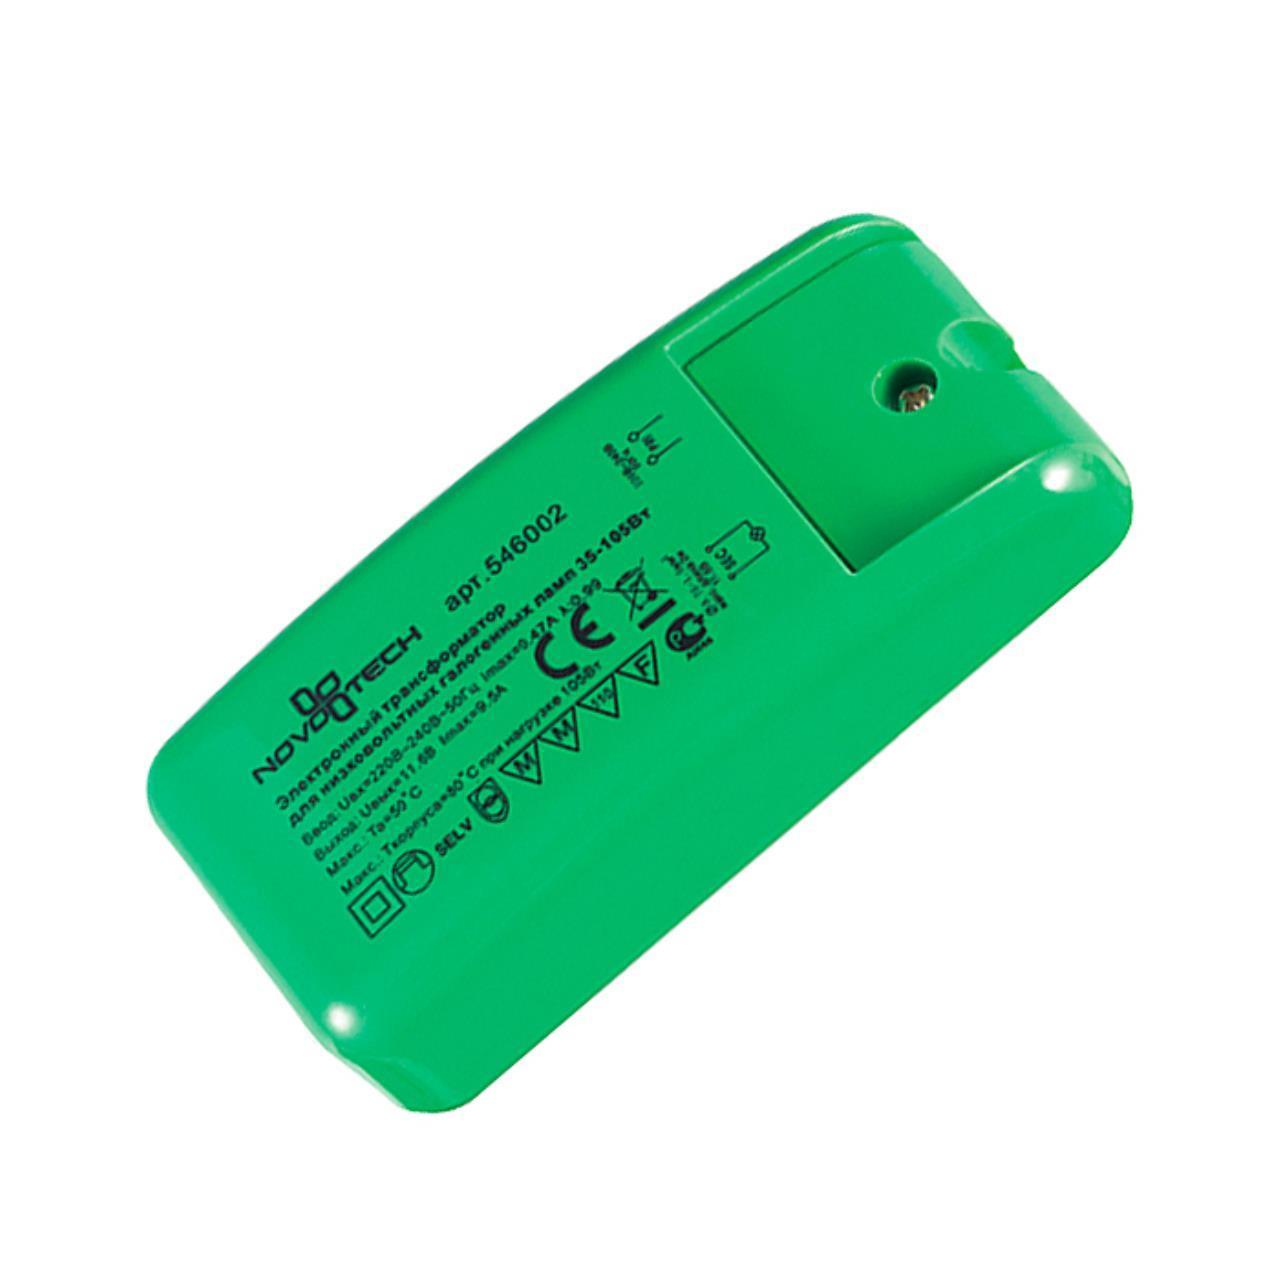 546002 NT12 023  Трансформатор IP20  35-105W  220-240V 50/60Гц